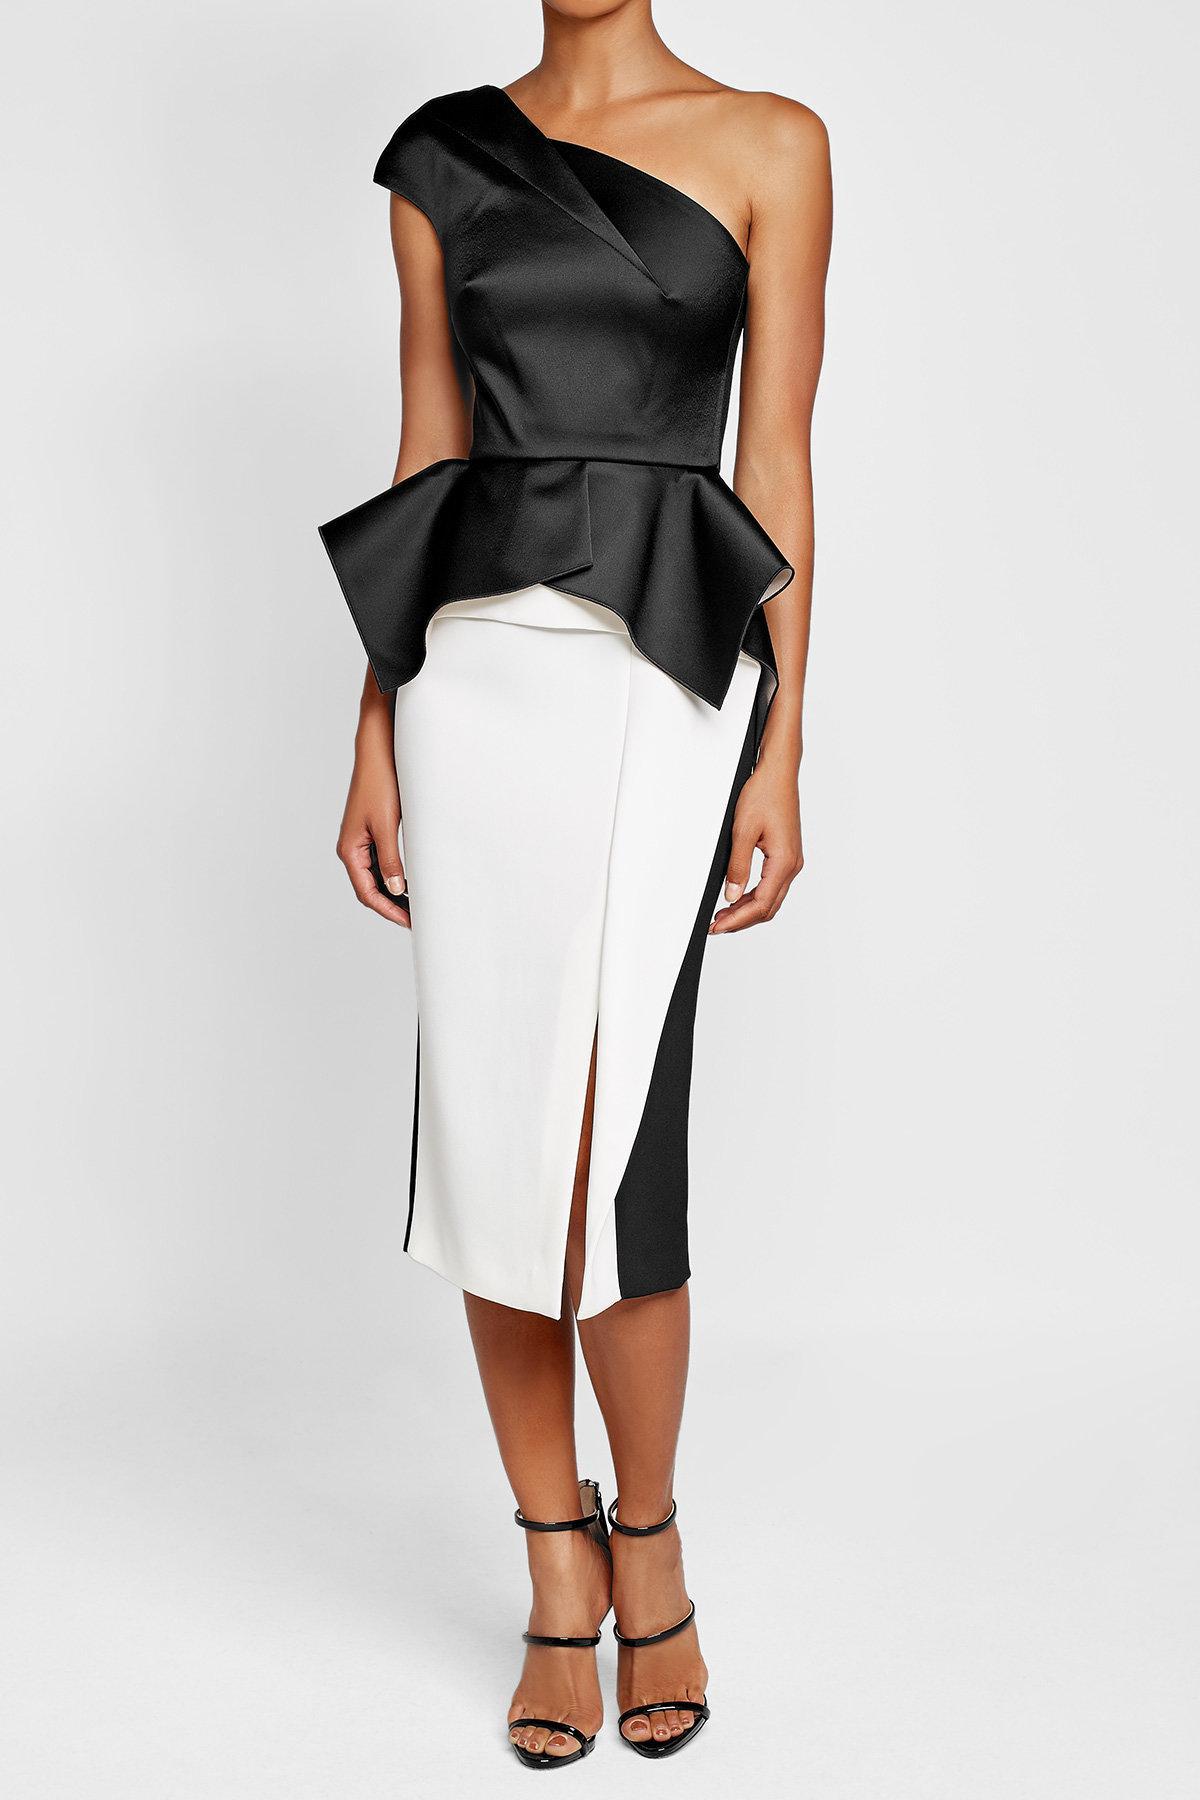 roland mouret pencil skirt in black lyst